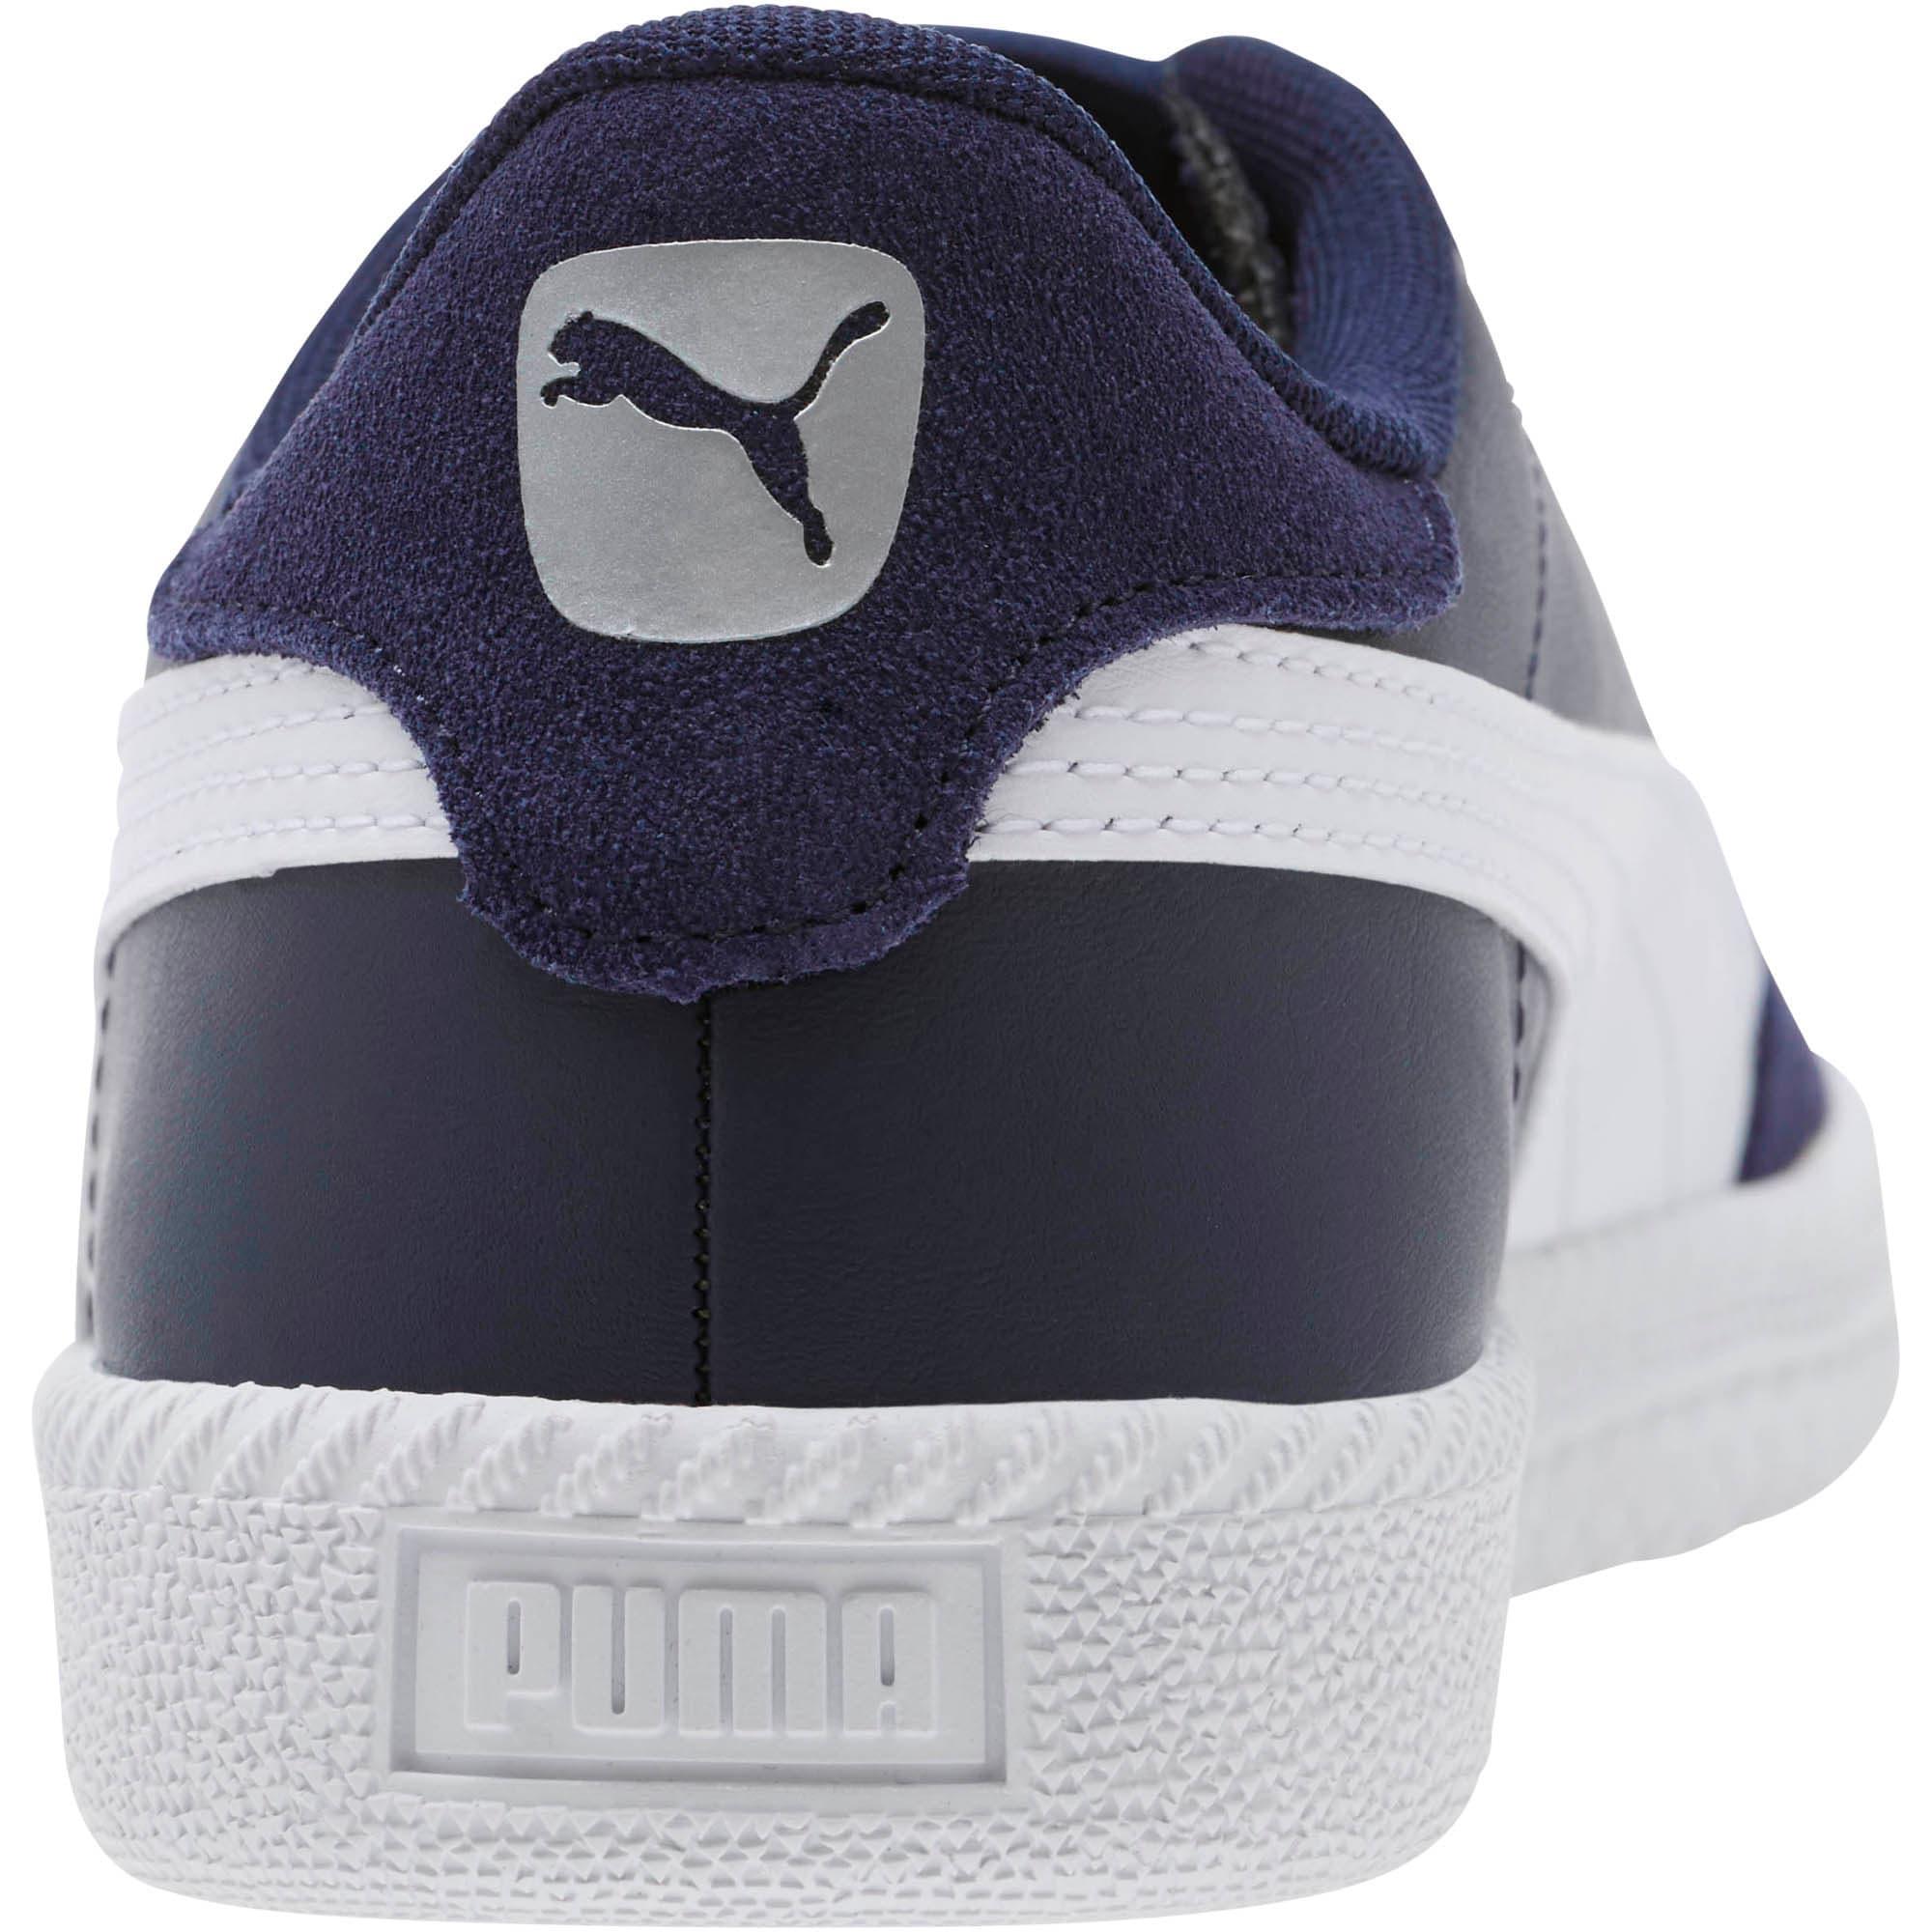 Thumbnail 4 of Astro Cup Sneakers, Peacoat-Puma White, medium